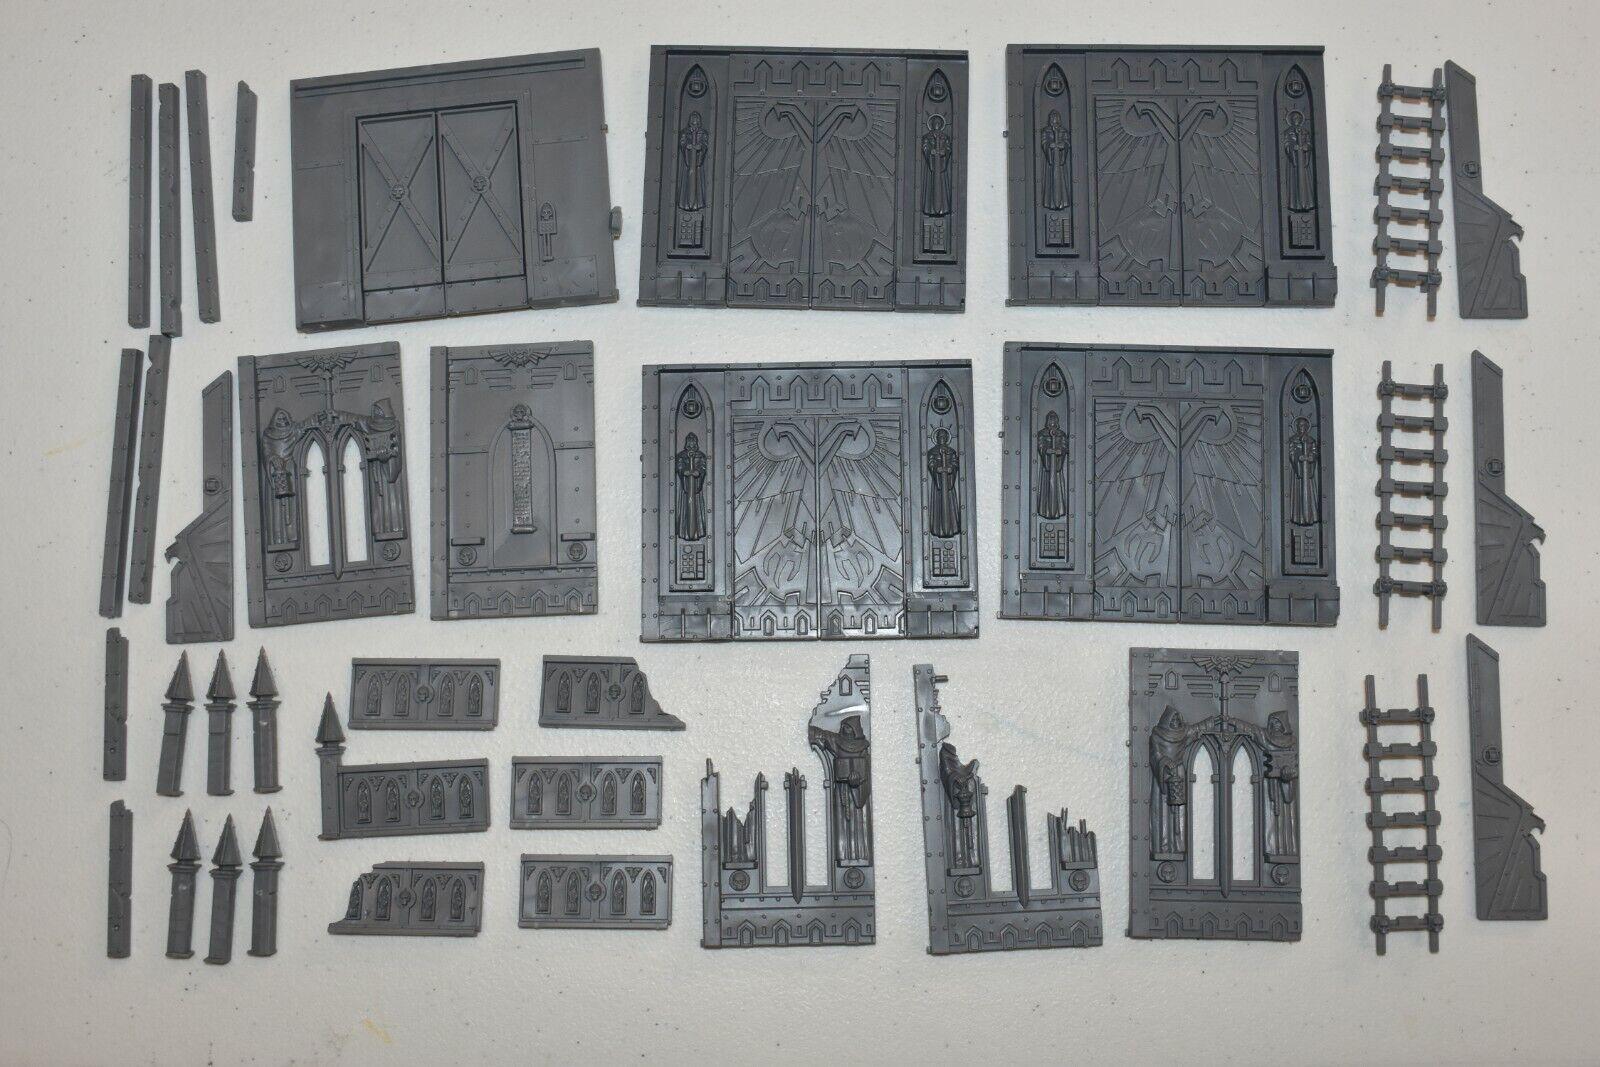 Imperial  Sanctum Warhammer 40K Scenery Terrain Ruins Parts Doors oop AILZ  Sconto del 40%